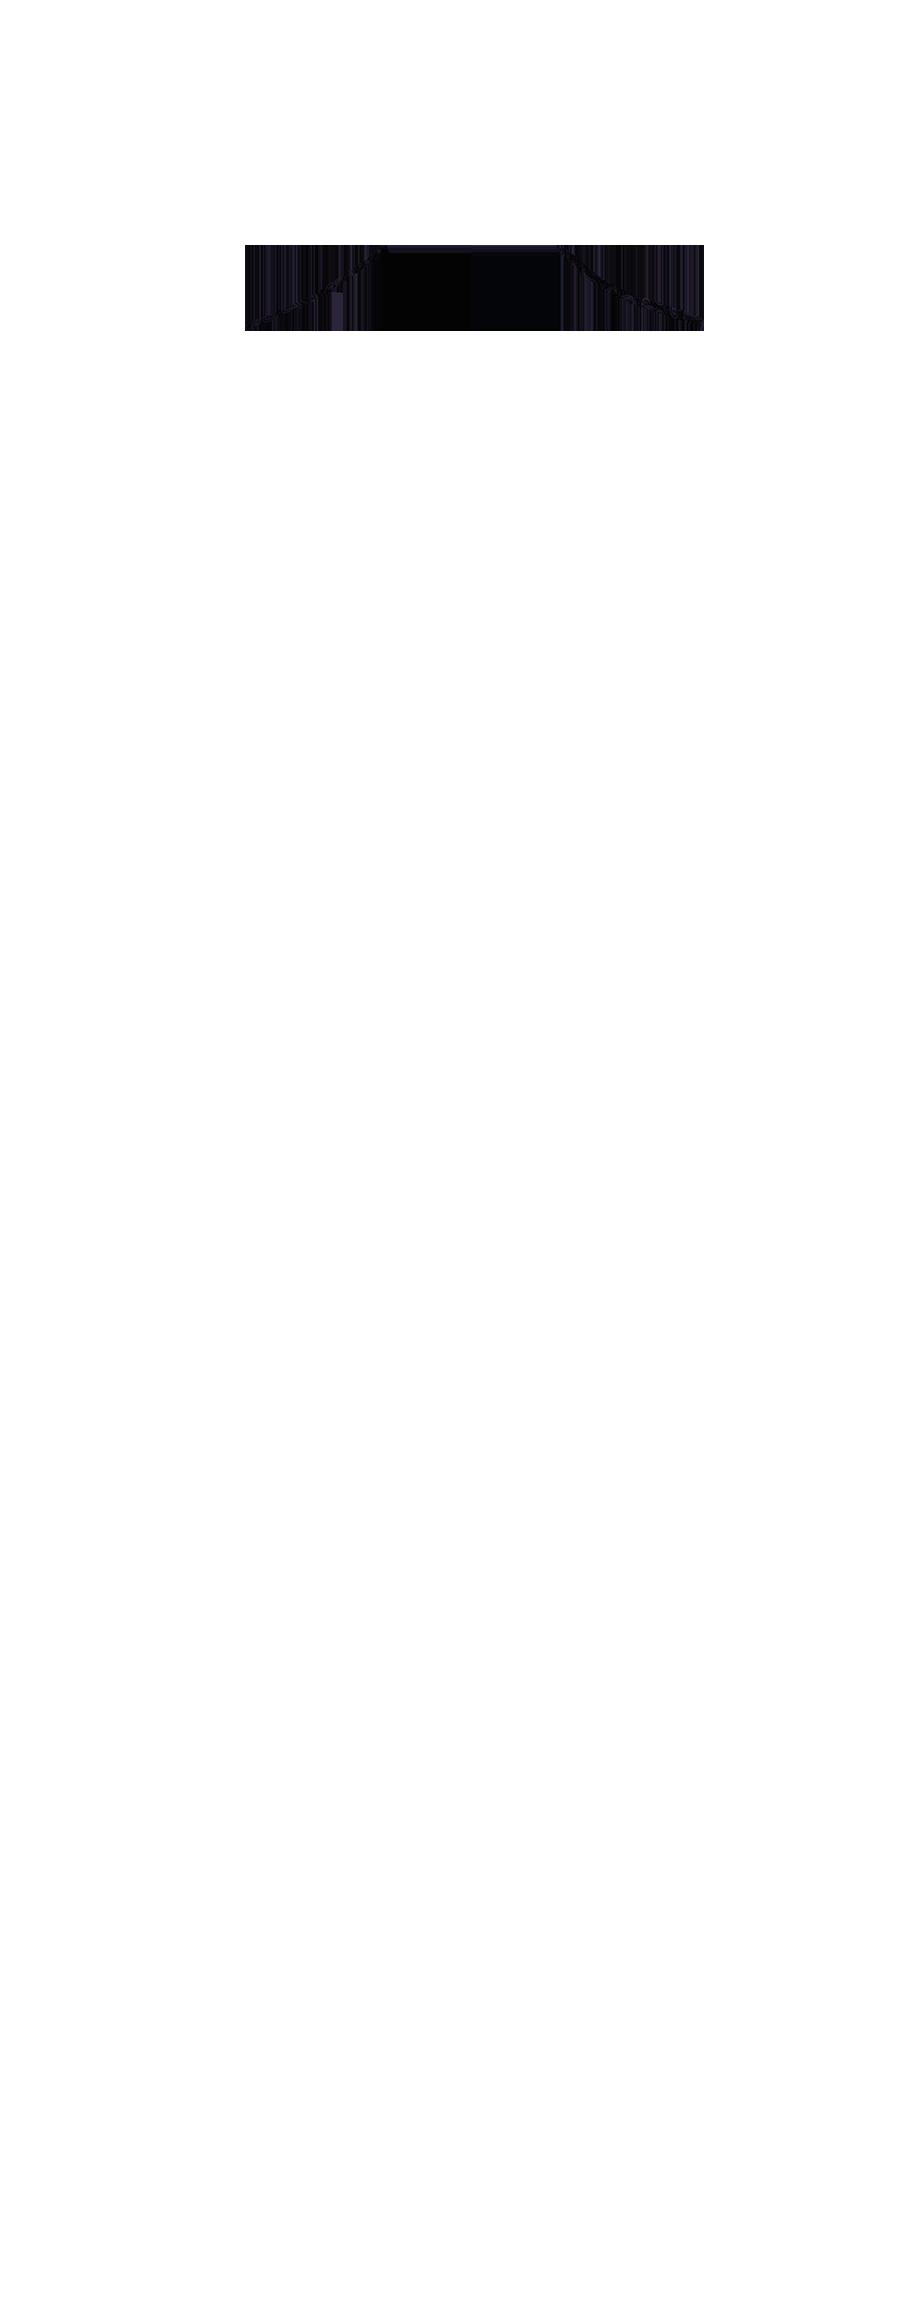 NEFL-10